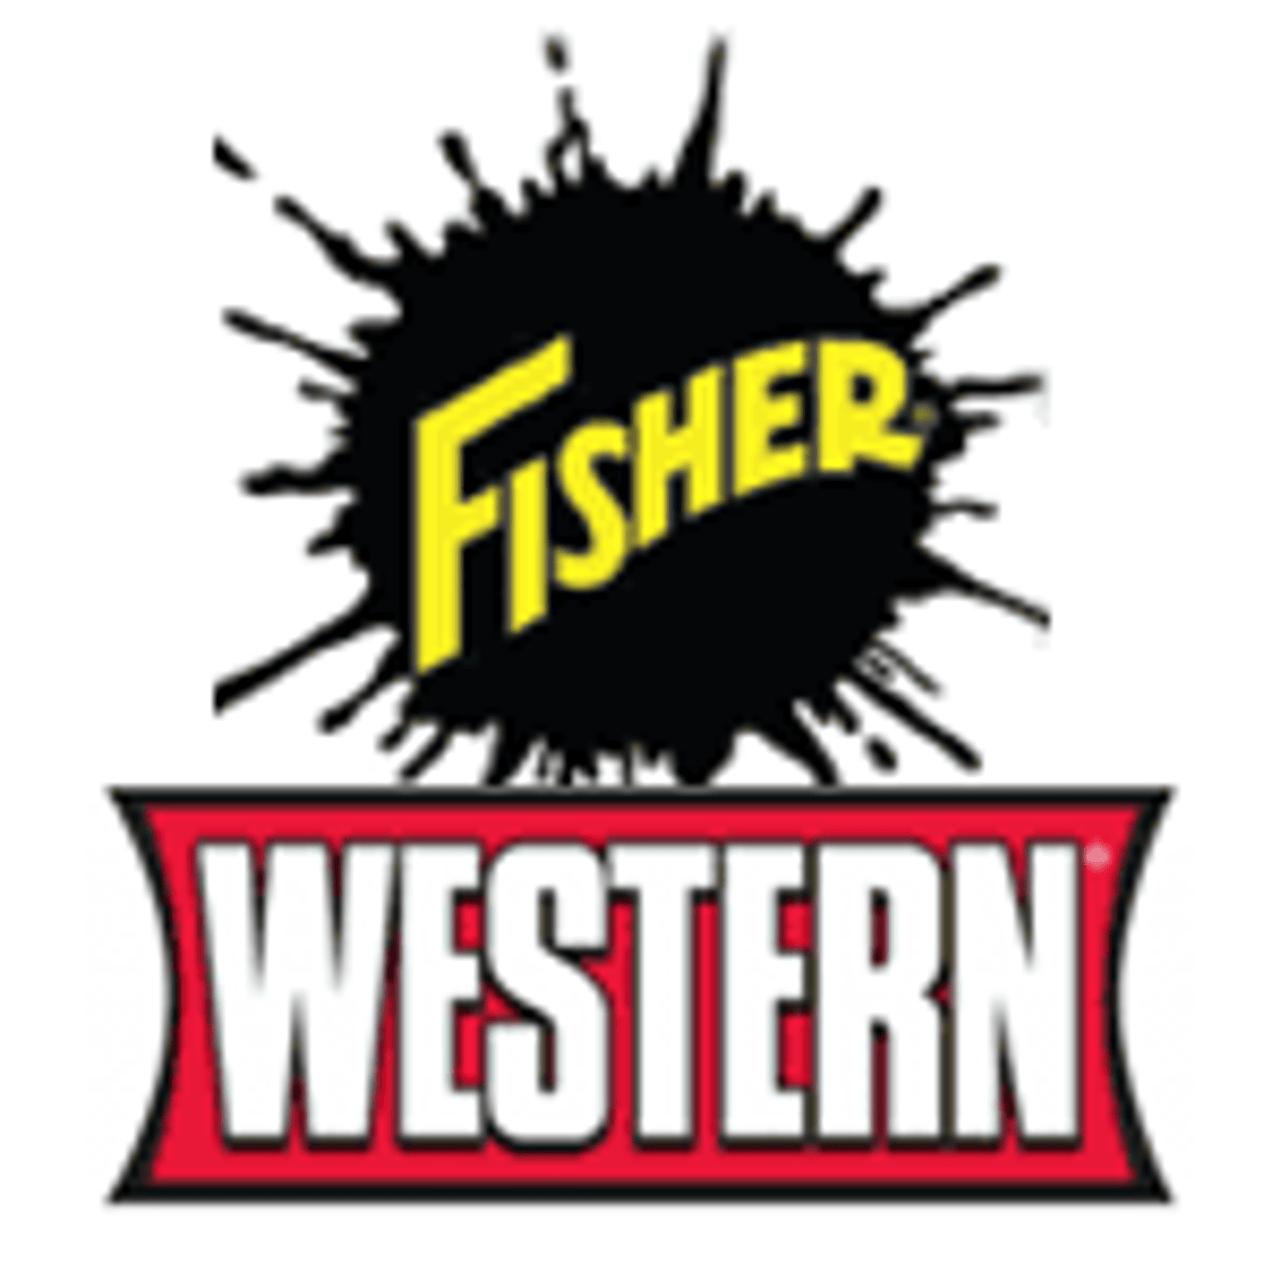 99494 FISHER STEEL-CASTER - WESTERN STRIKER STROBE LIGHT KIT - (ELECTRIC)